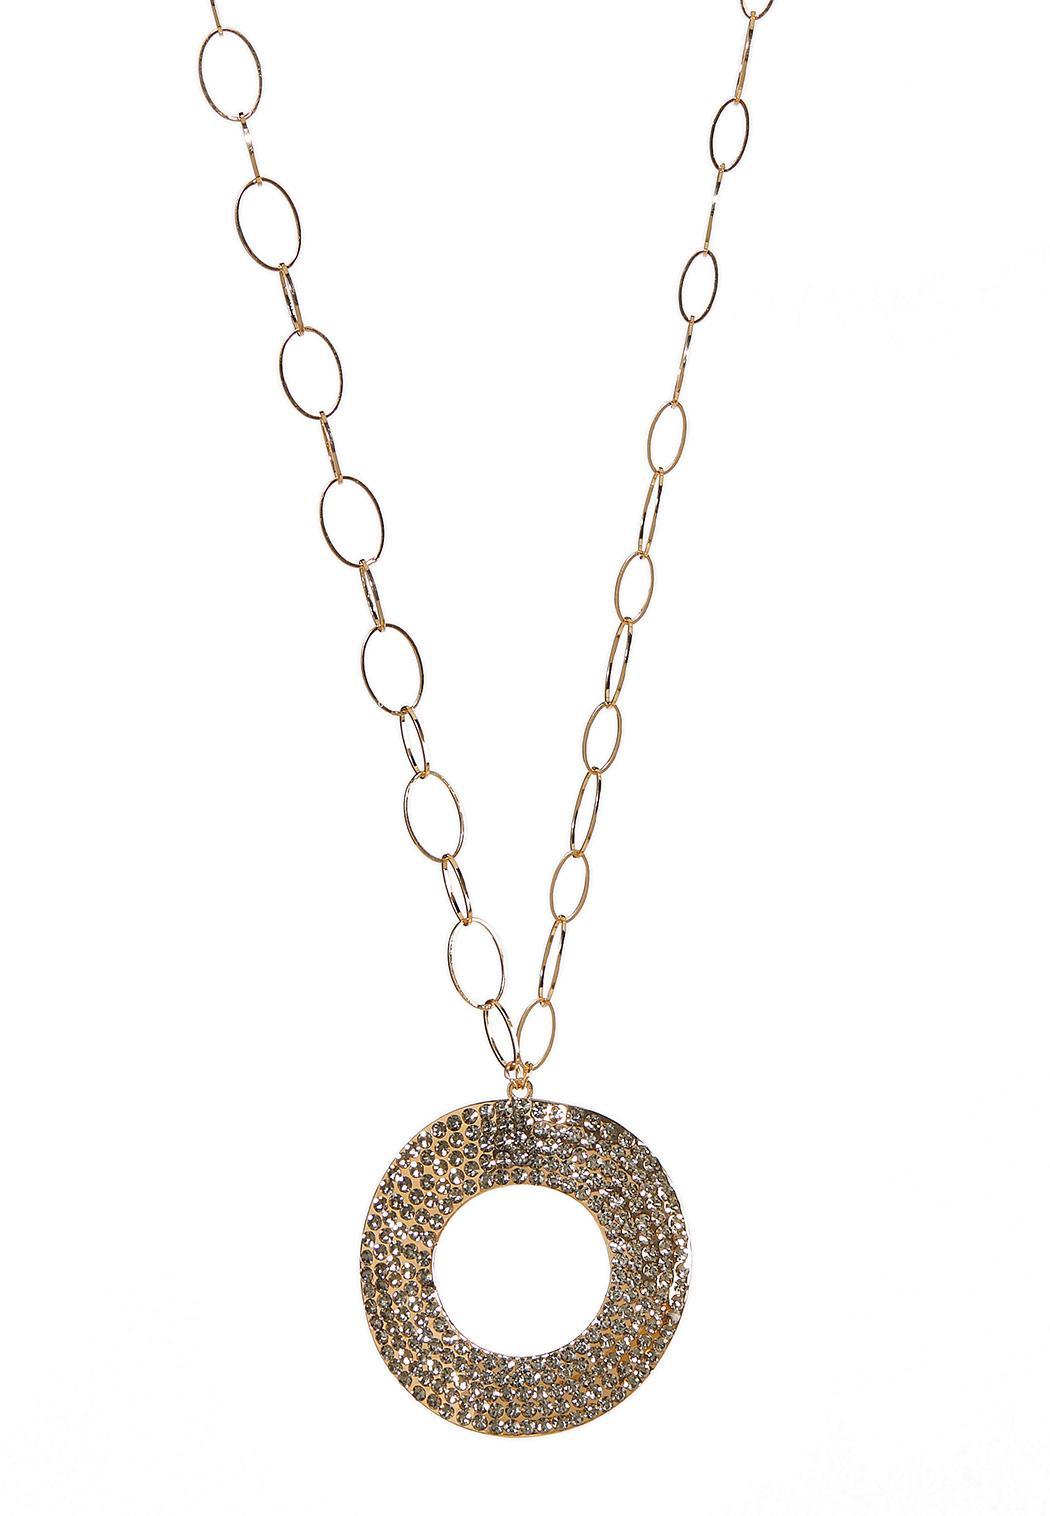 Statement Stone Pendant Necklace